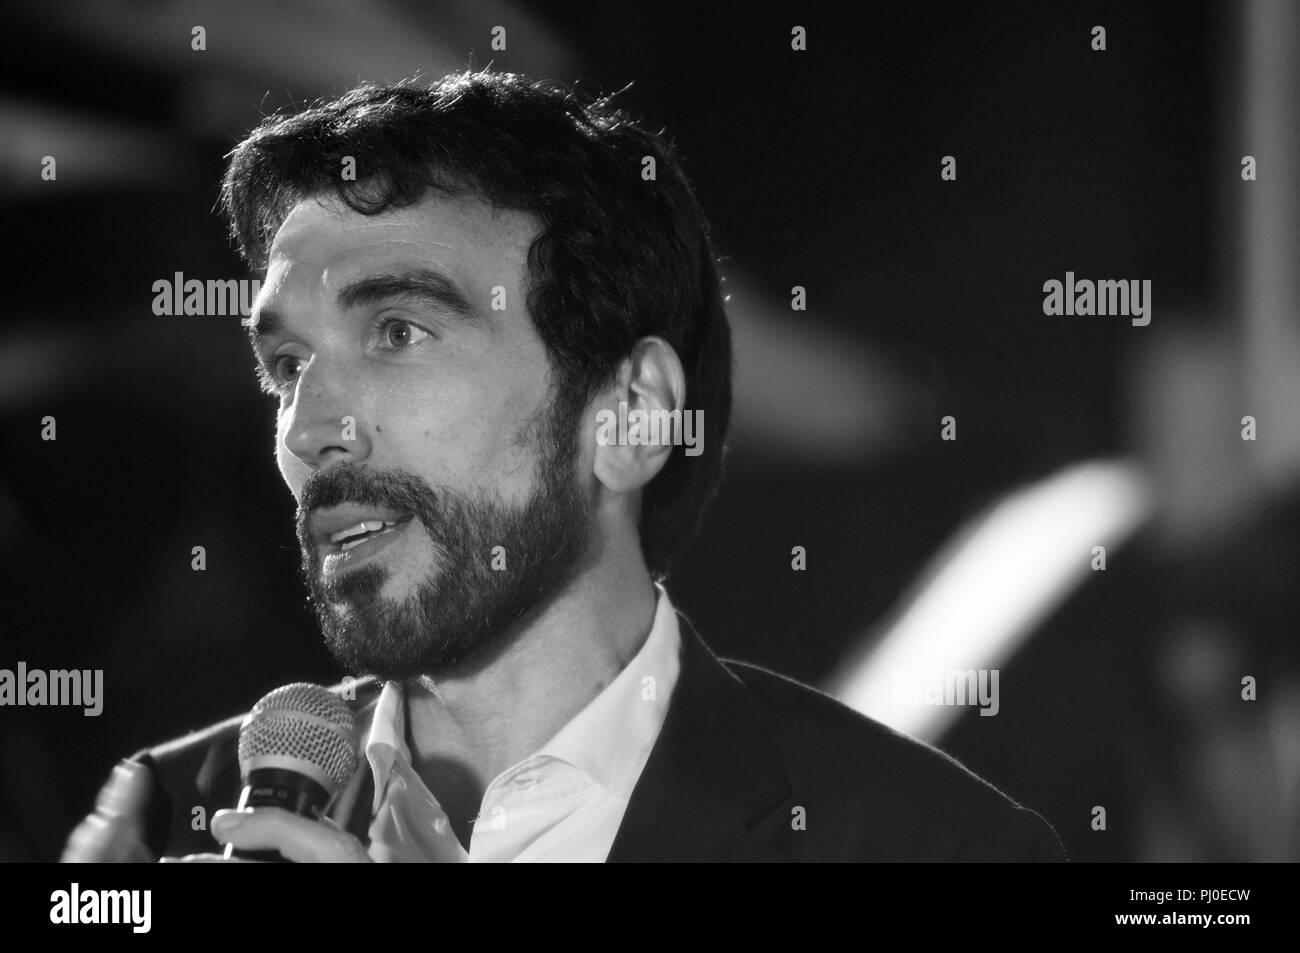 02 September 2018 Italy, Lombardy, Crema, Maurizio Martina is an Italian Politician - Stock Image